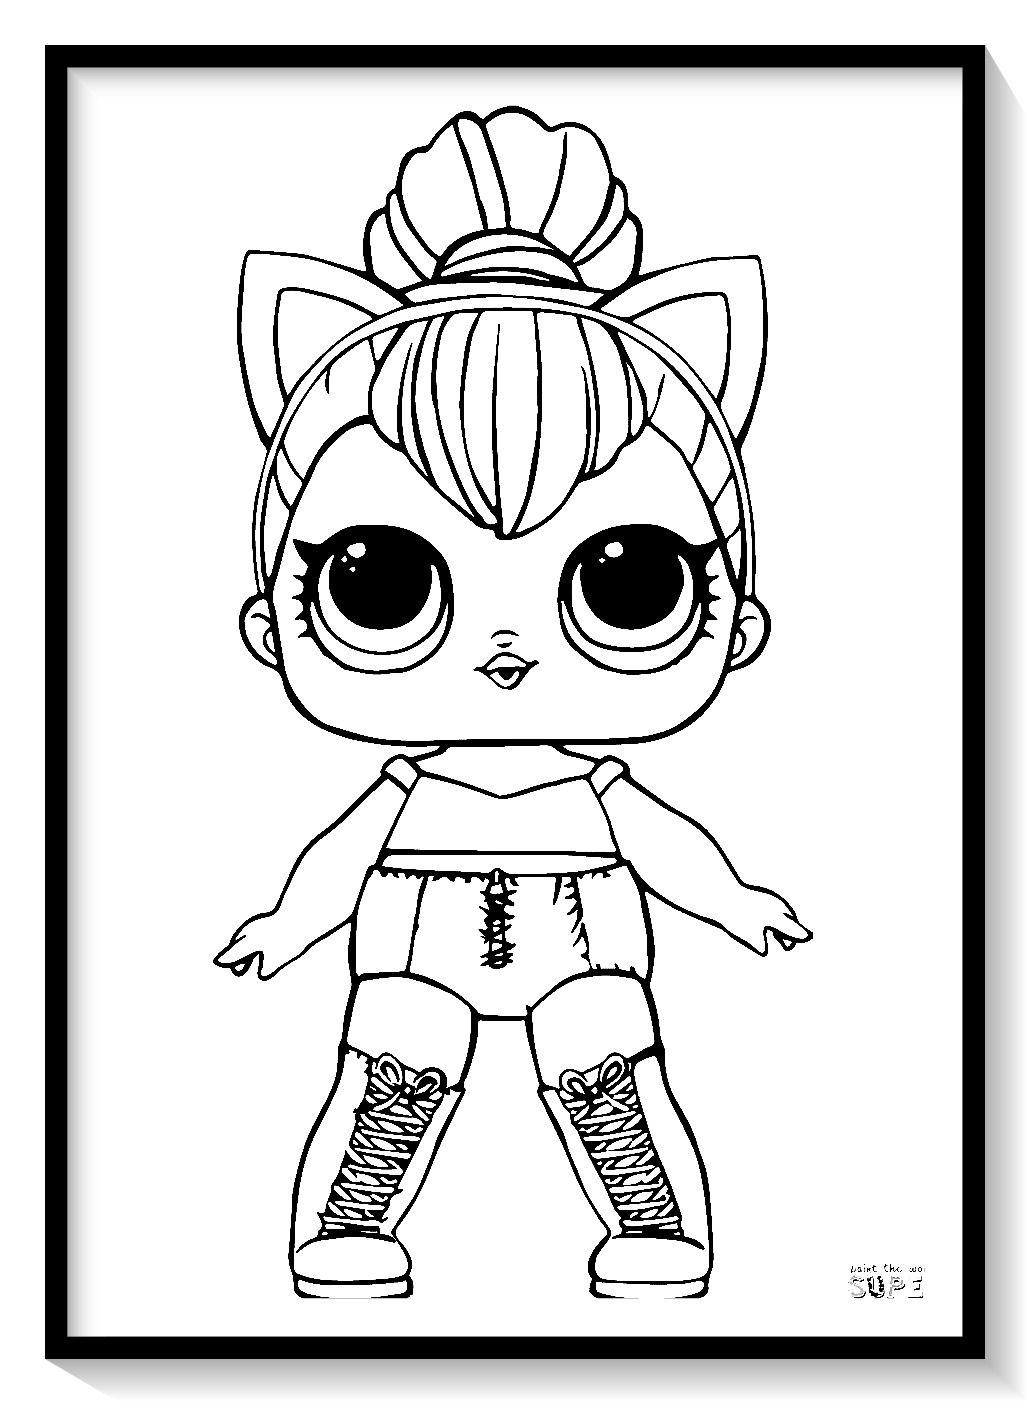 Munecas Lol Para Colorear Online Dibujar Y Pintar Munecas Lol Imprimir Imagen Munecas Lol Dibujos Para Imprimir Gratis Unicornios Wallpaper